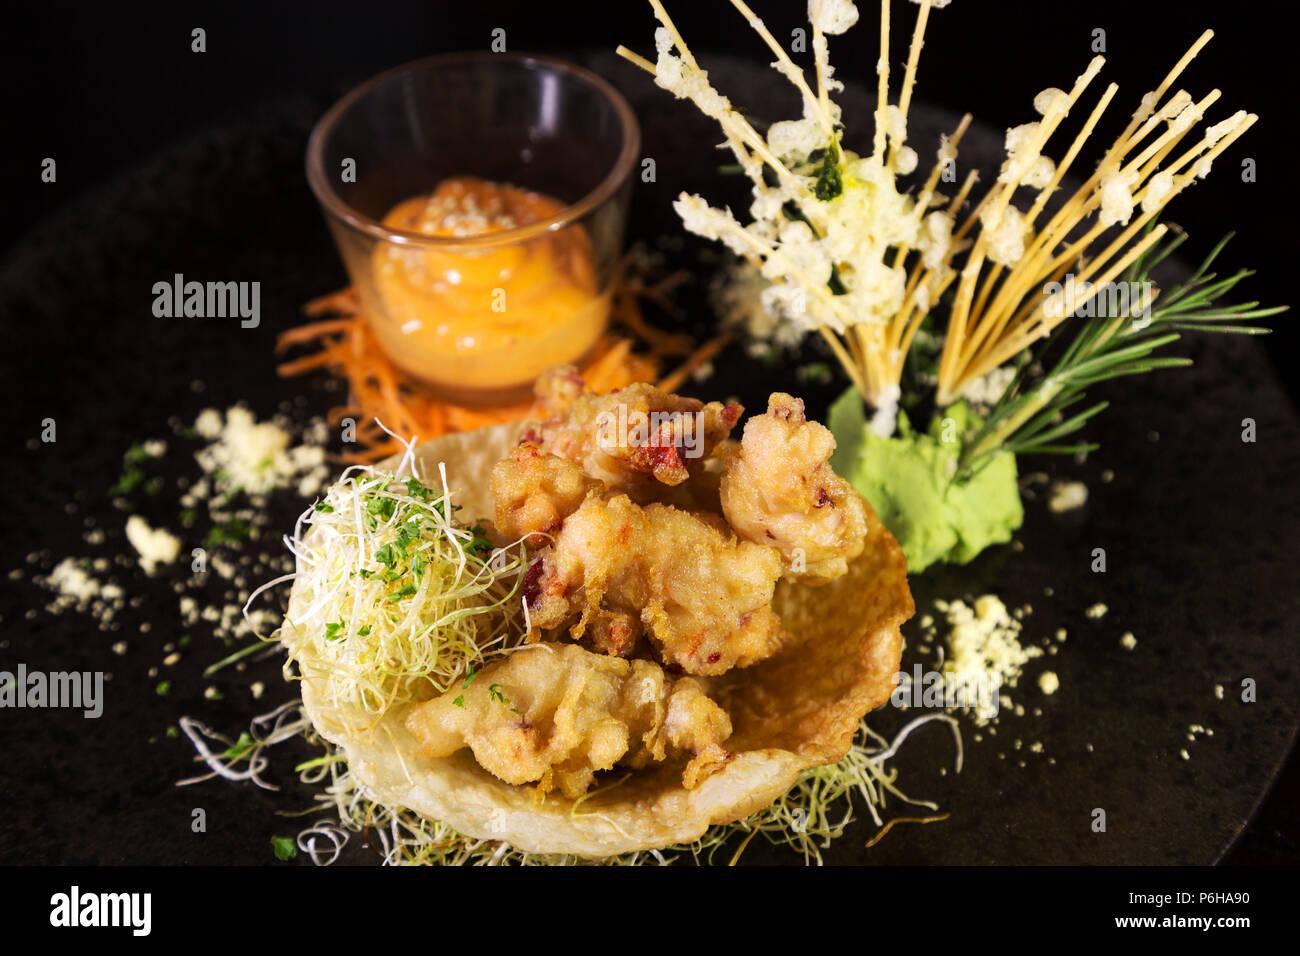 Lobster tempura with Sriracha mayo. The deep fried dish has Asian influences. - Stock Image